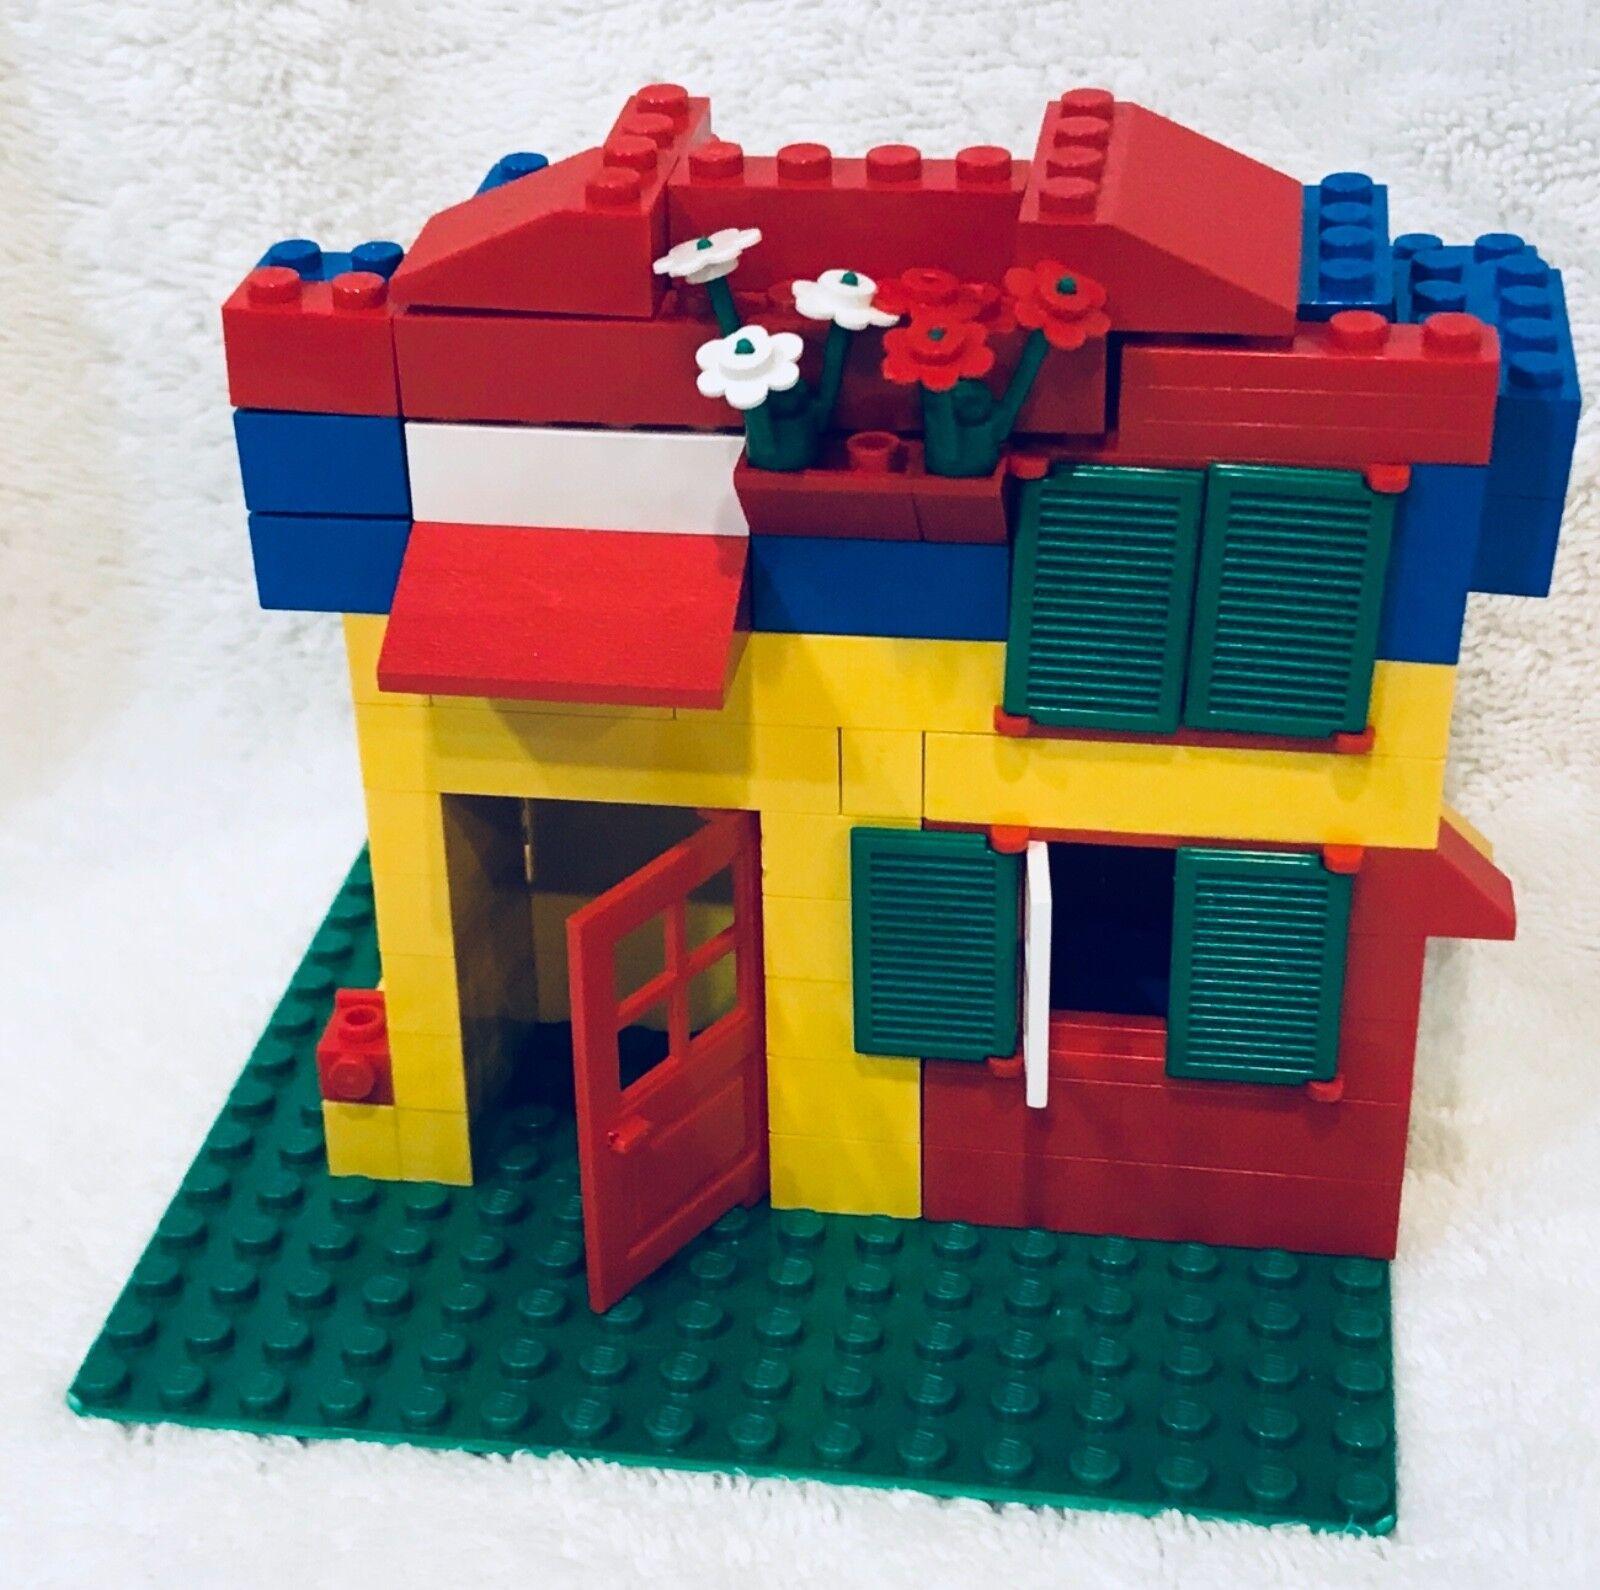 LEGO UNIVERSAL BULDING SET(555) AGE 5-7 VINTAGE w/ box